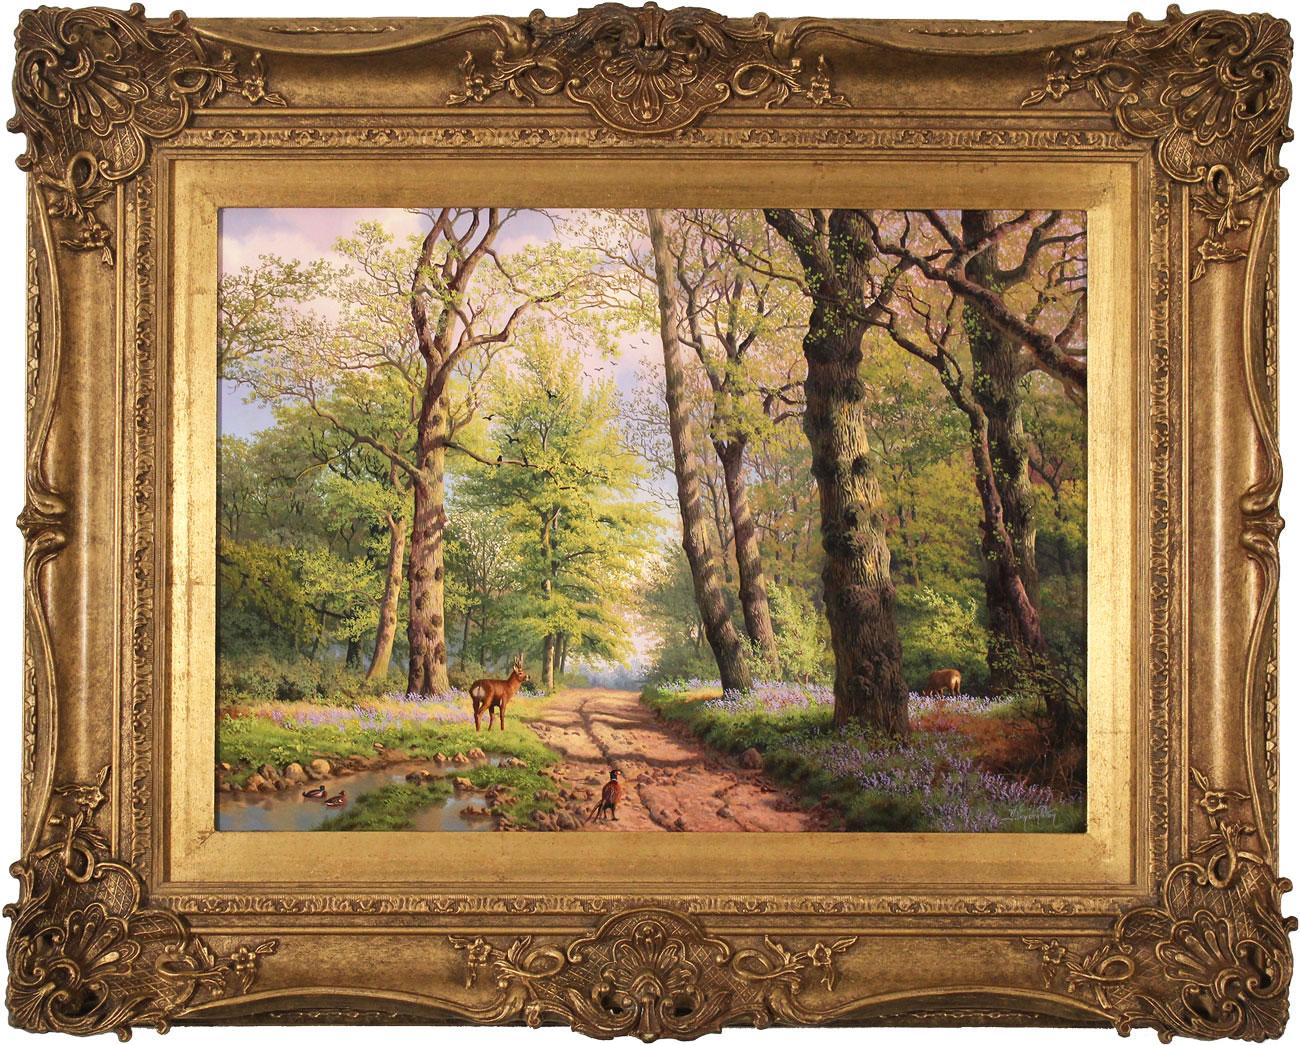 Daniel Van Der Putten, Original oil painting on panel, Middleton Woods, Ilkley, Yorkshire , click to enlarge